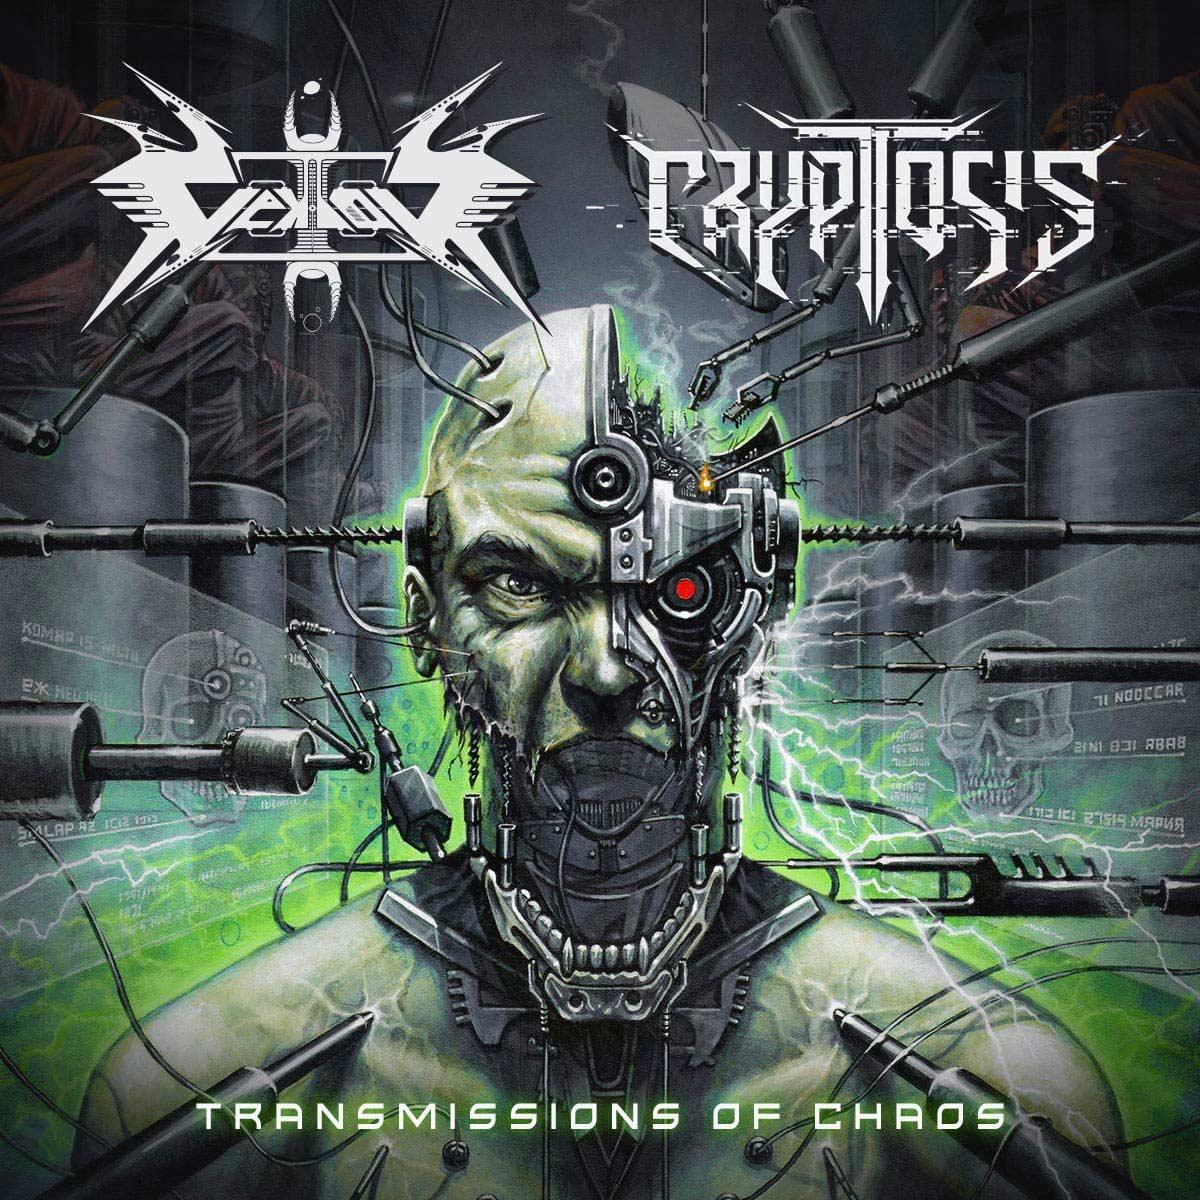 Vektor / Cryptosis - Transmissions of Chaos